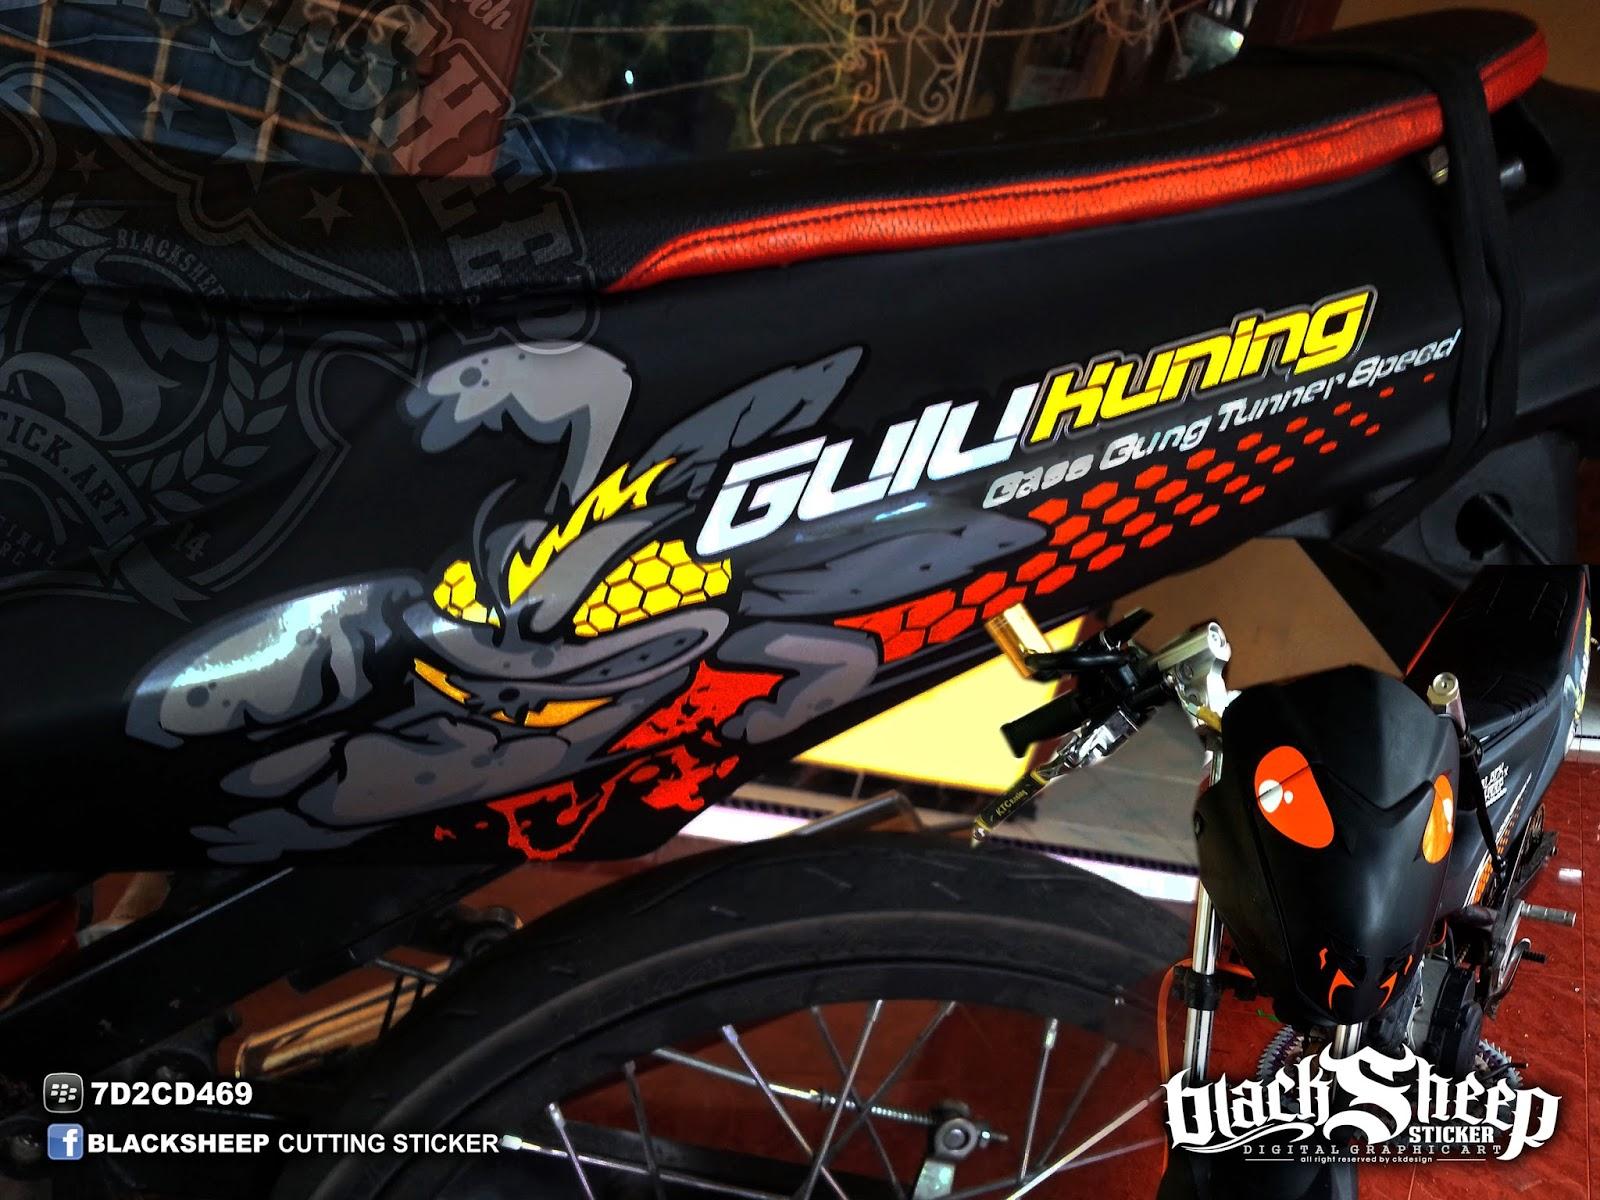 Satria F150 gulu kuning custom cutting sticker